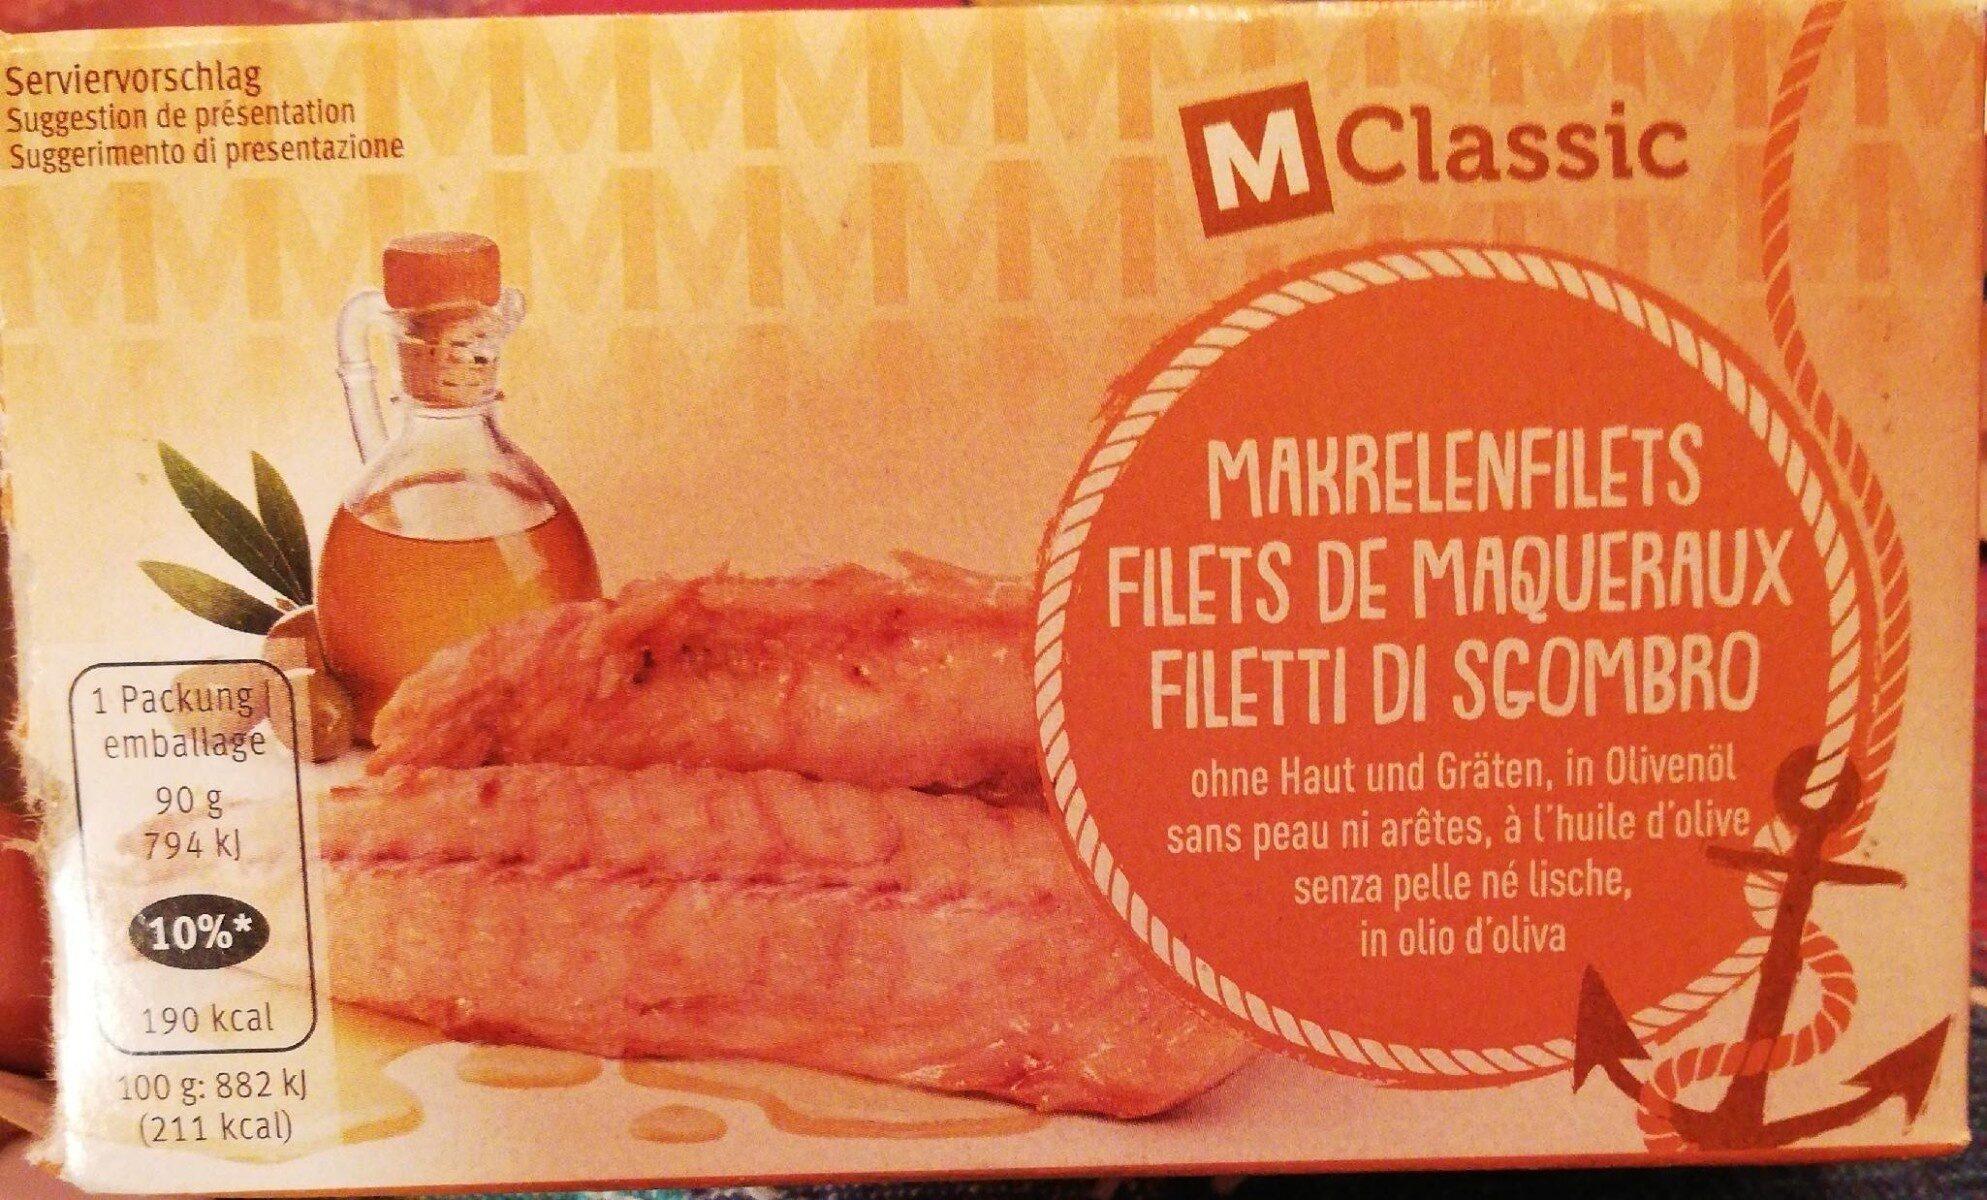 Filets de maqueraux - Prodotto - fr